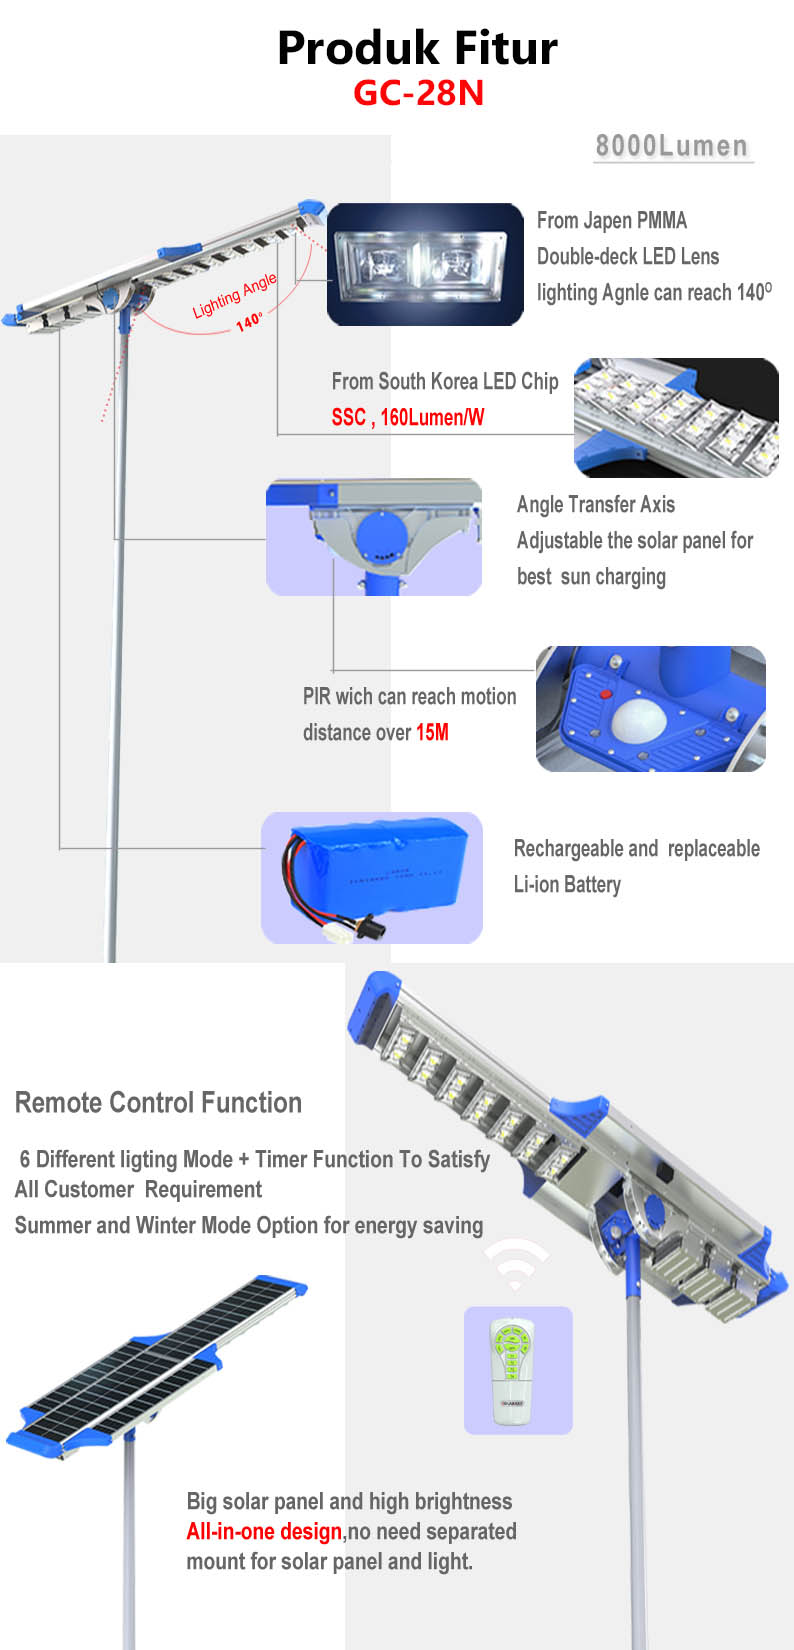 Jual lampu jalan all in one model titan tenaga surya 80 watt, harga lampu pju tenaga surya, jual murah lampu pju all in one 80 watt